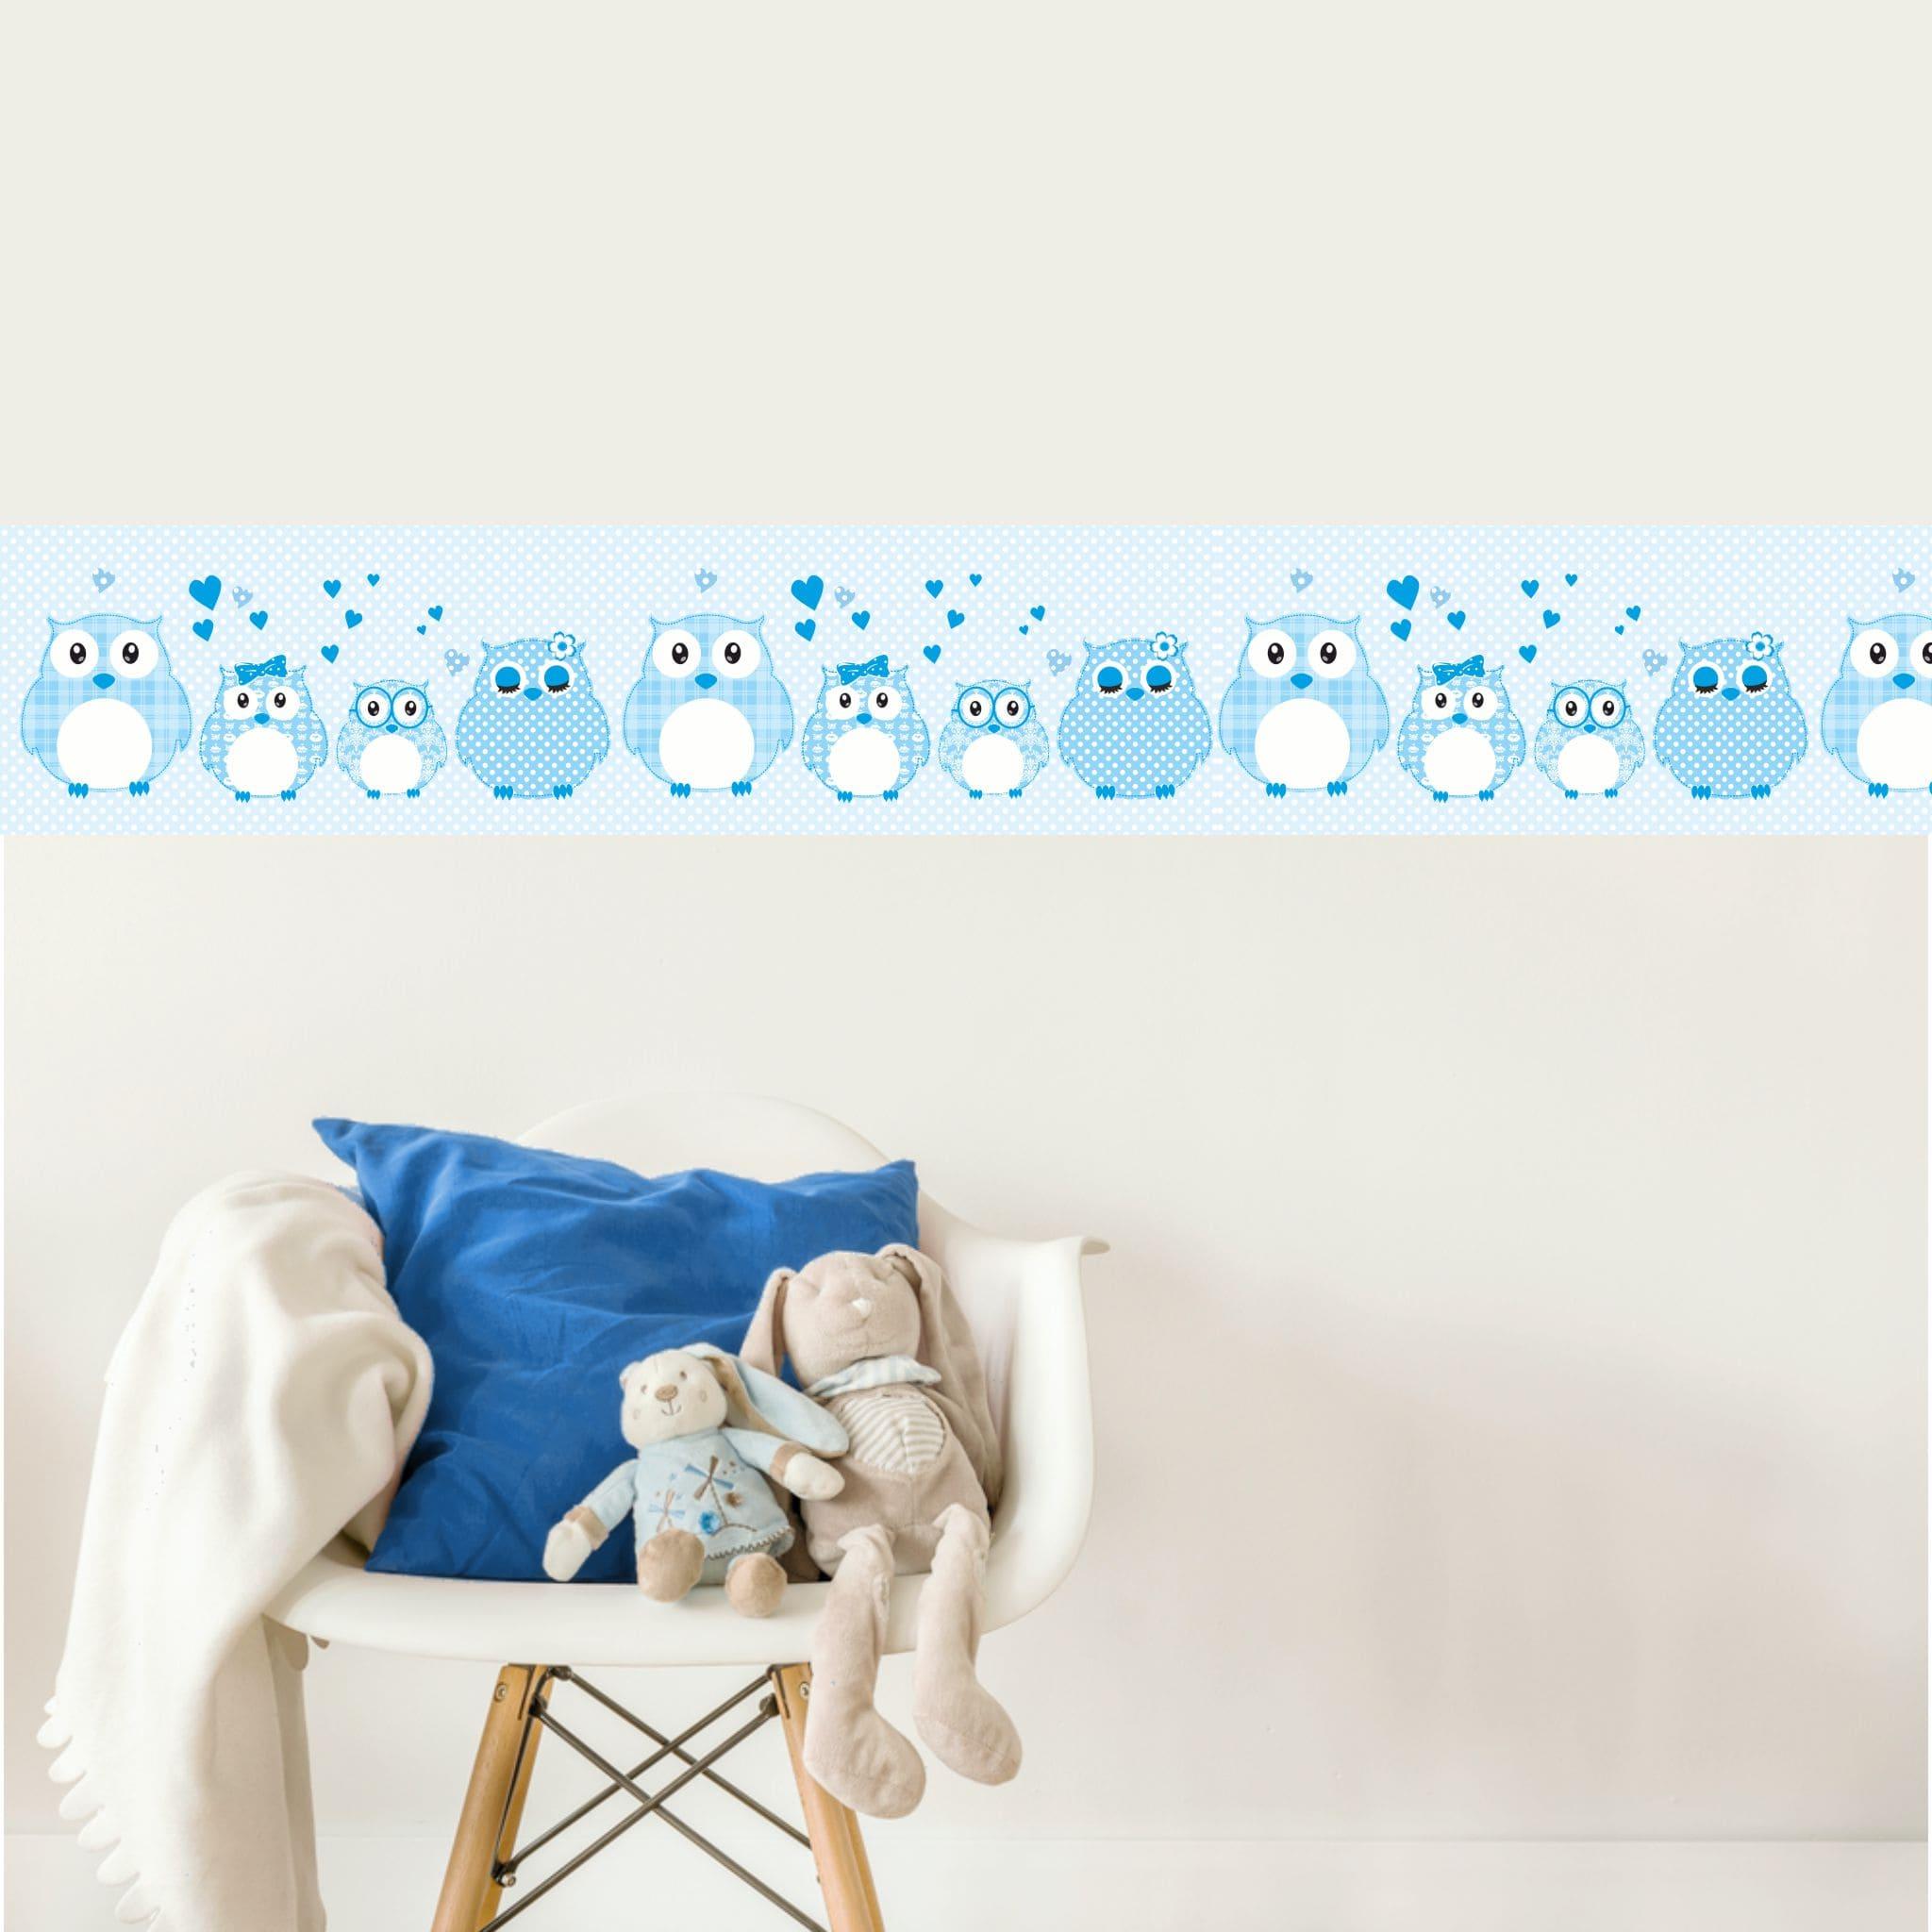 Vlies Bordüre selbstklebend fürs Kinderzimmer Patchwork blau ...